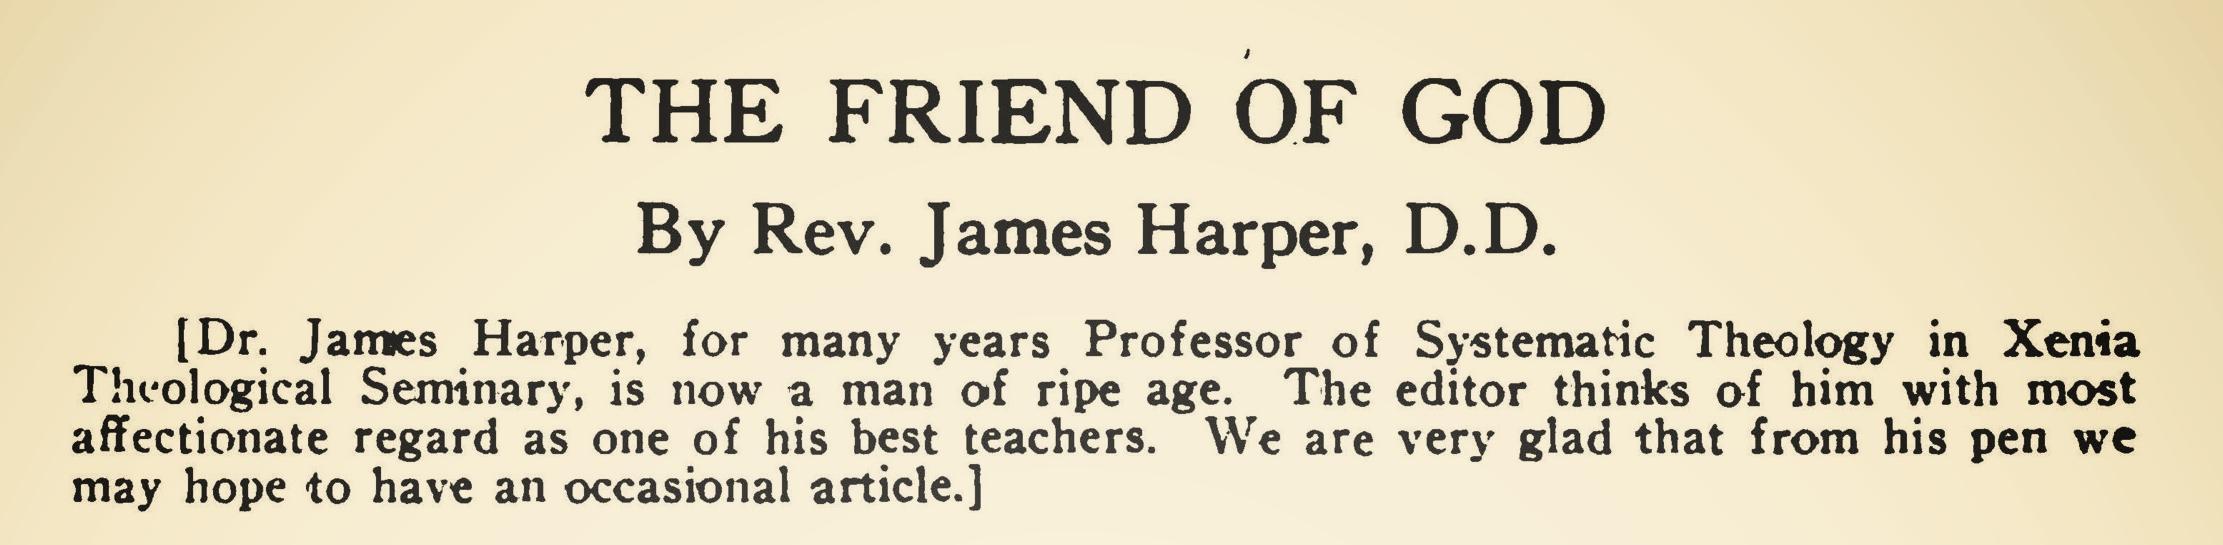 Harper, James, The Friend of God Title Page.jpg